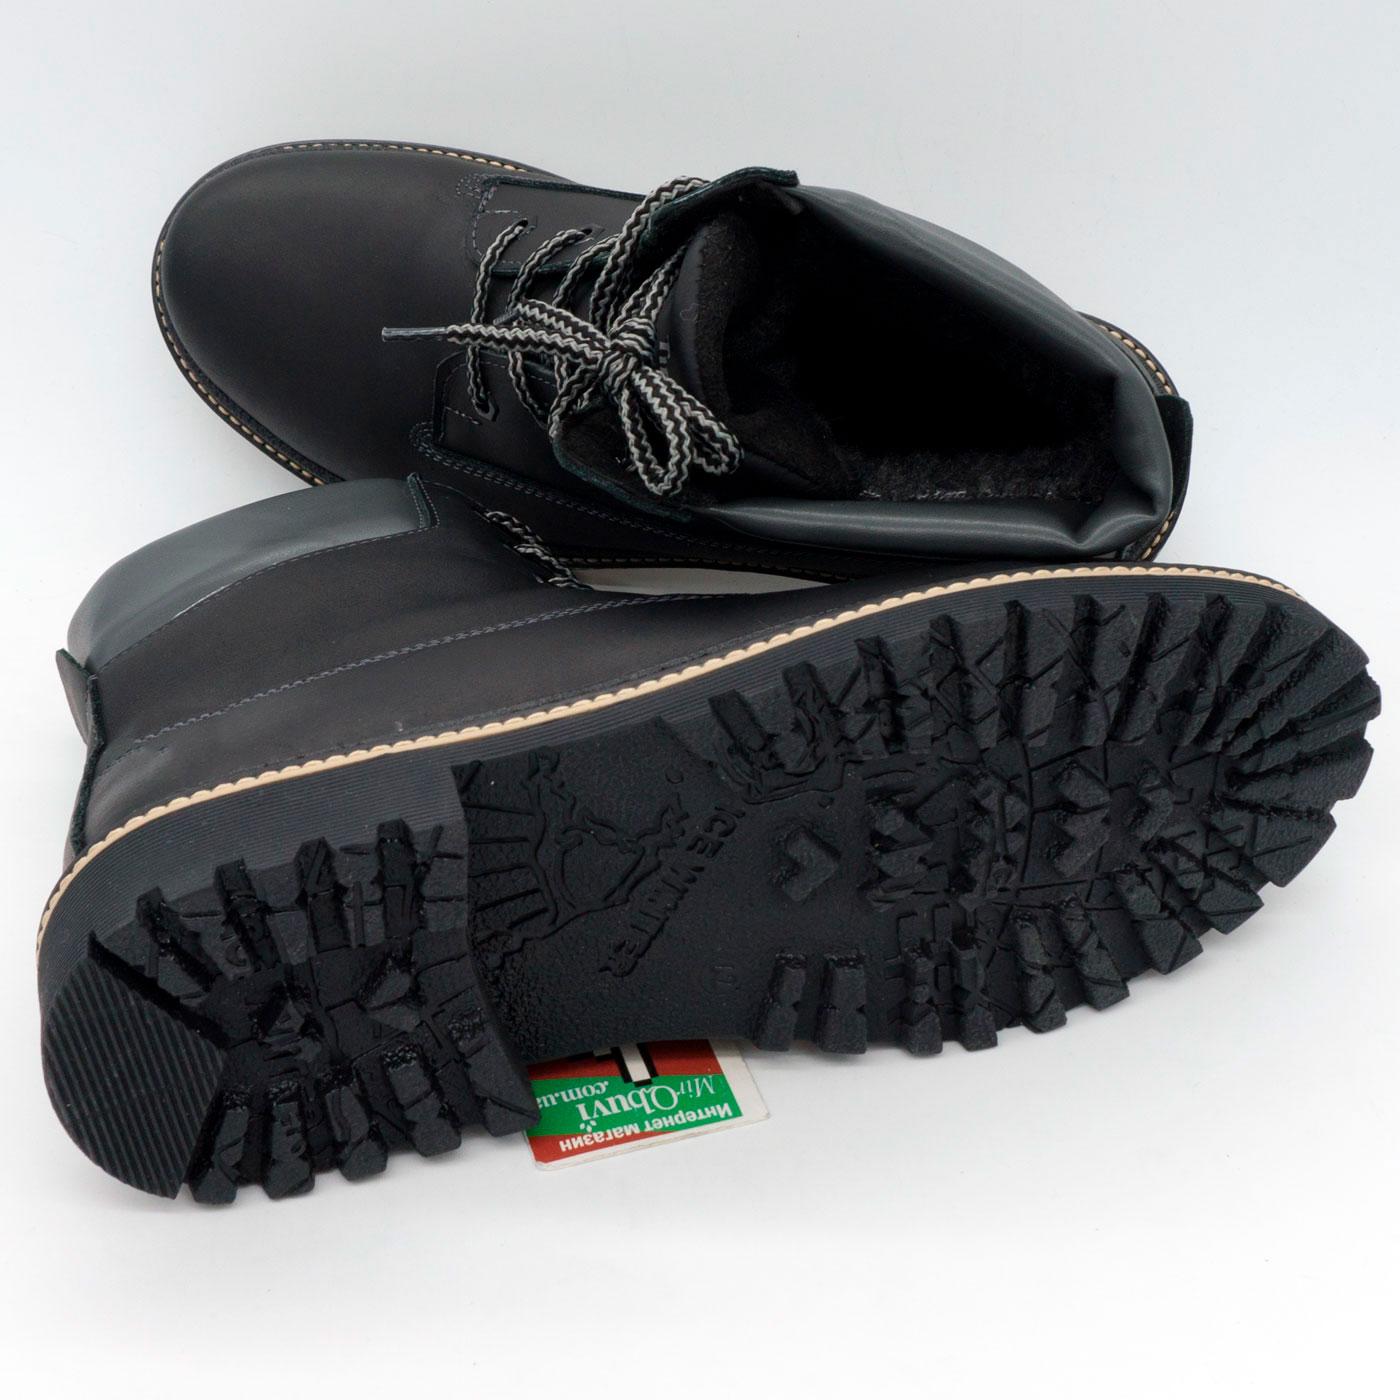 фото bottom Черные мужские ботинки Реплика Timberland 103 (Тимберленд)  bottom